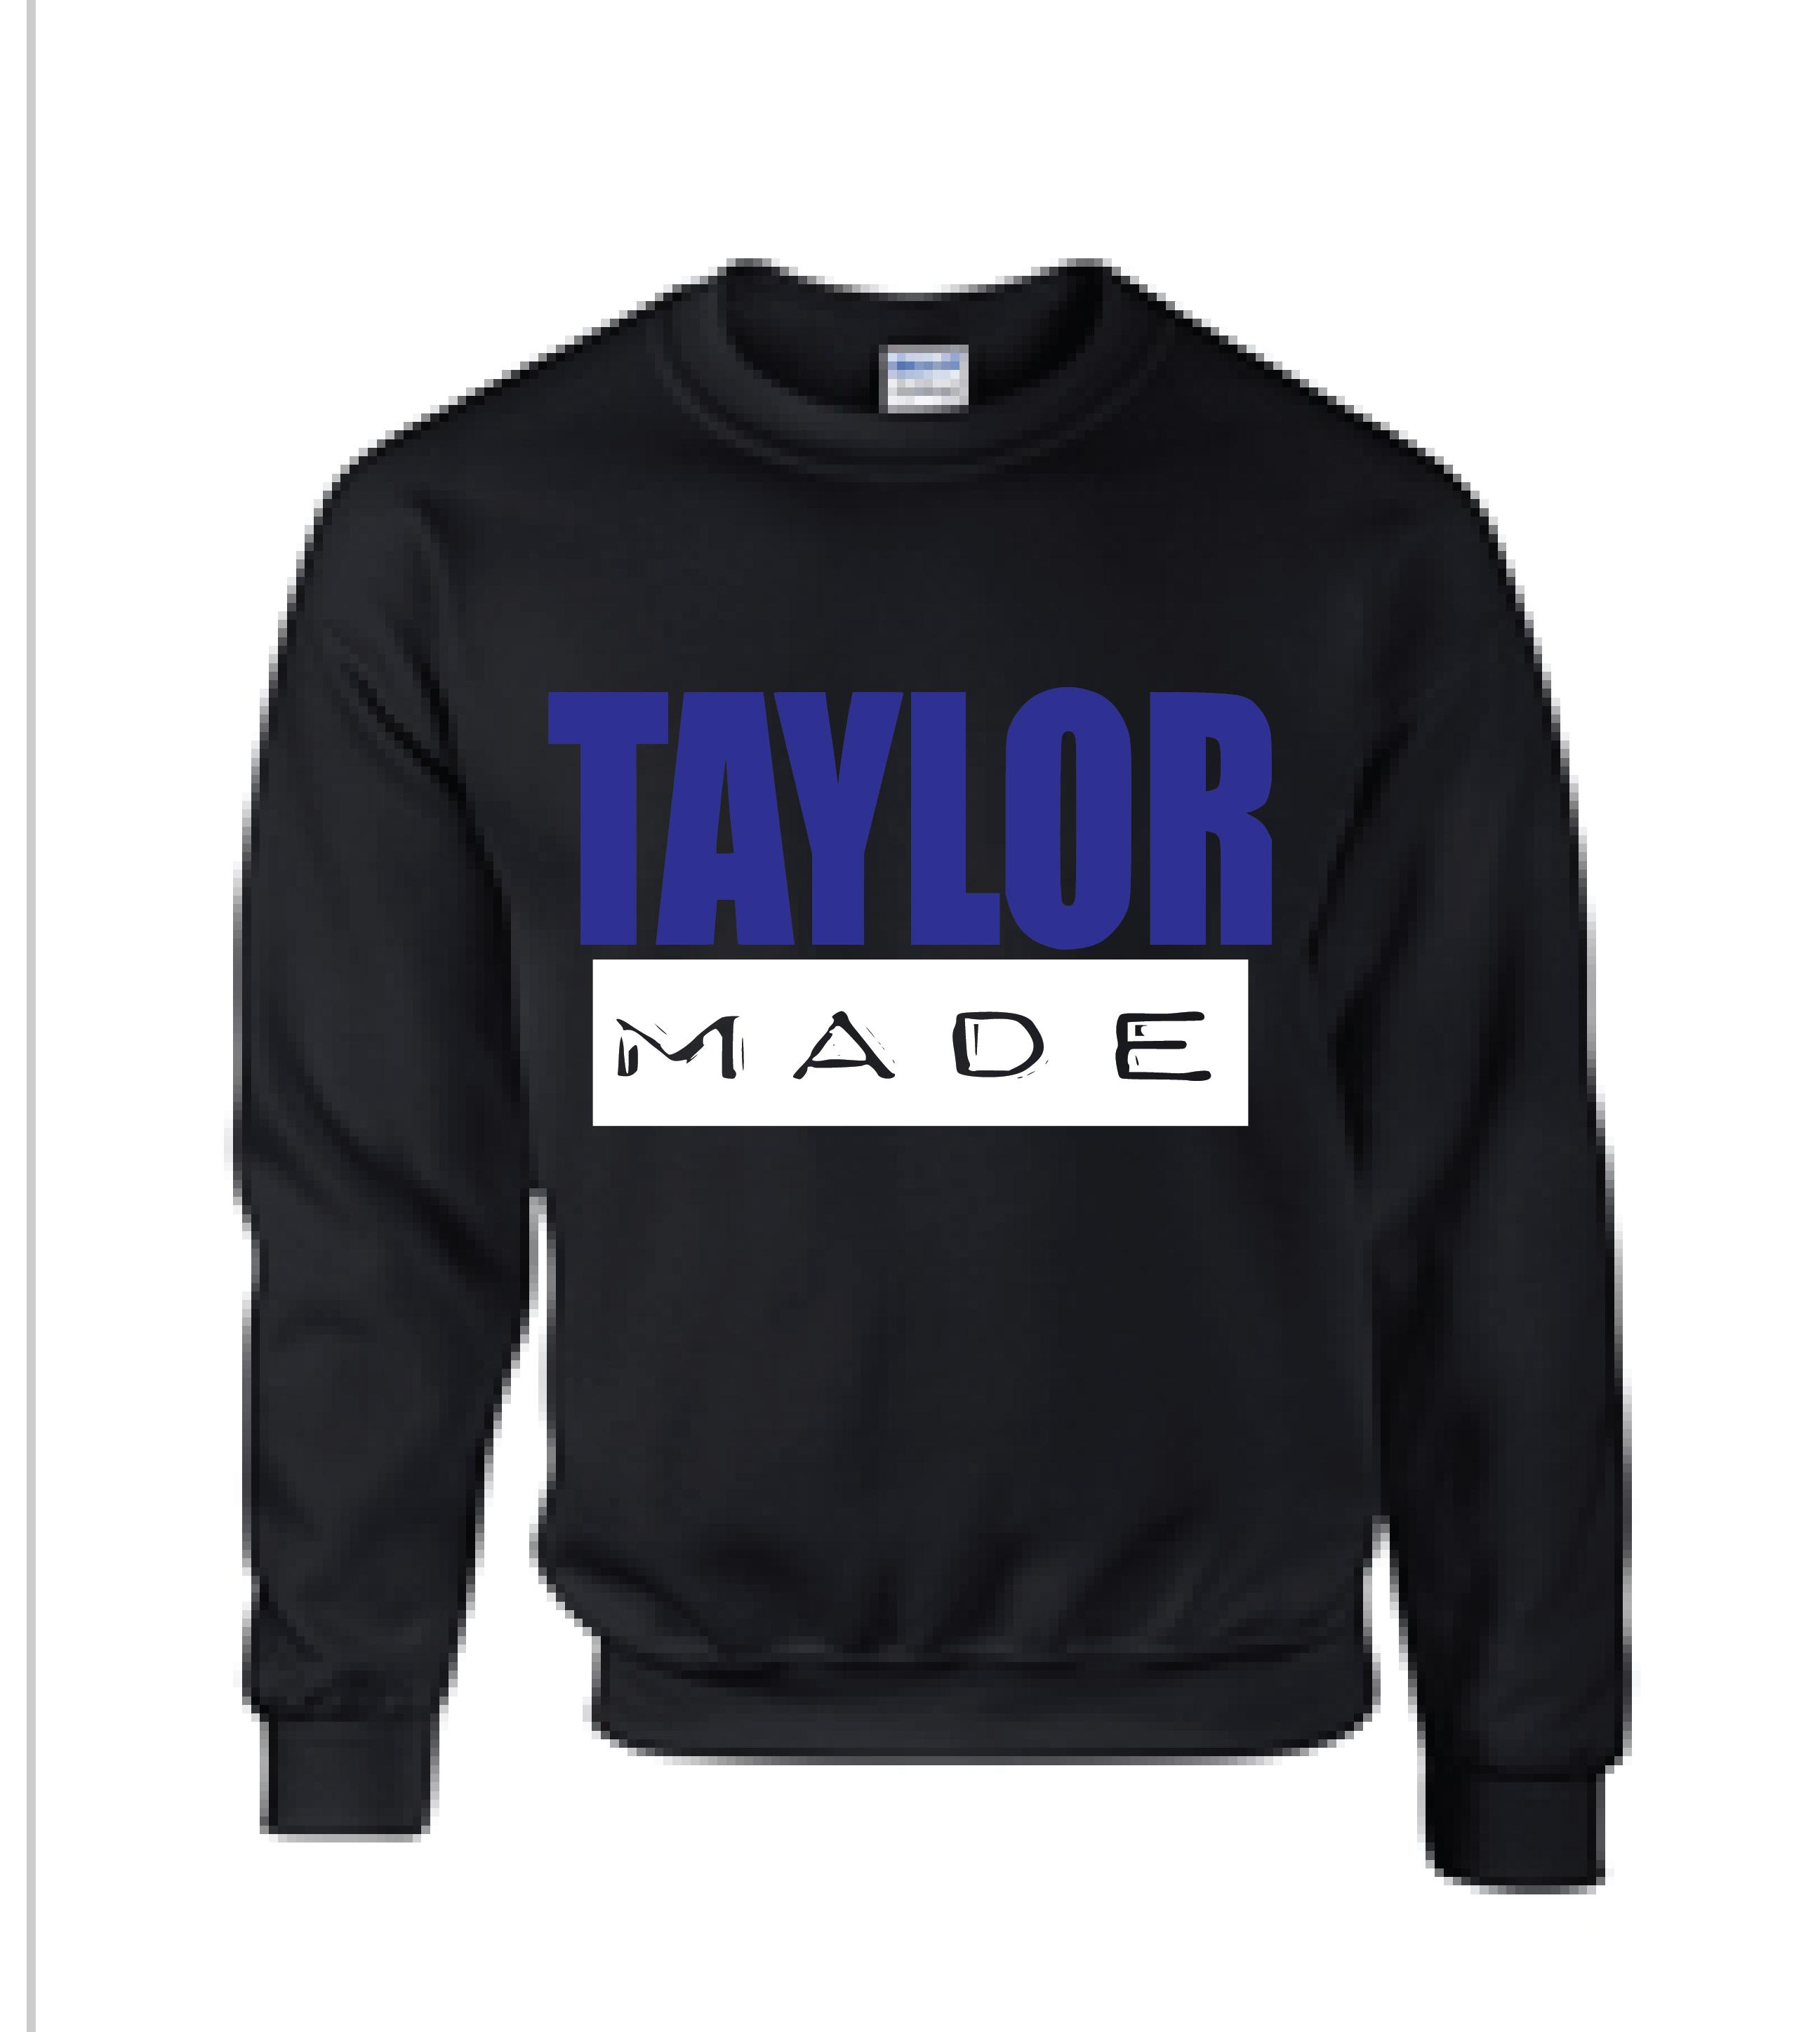 Phi Beta Sigma Taylor Made Sweatshirt φβσ In 2019 Phi Beta Sigma